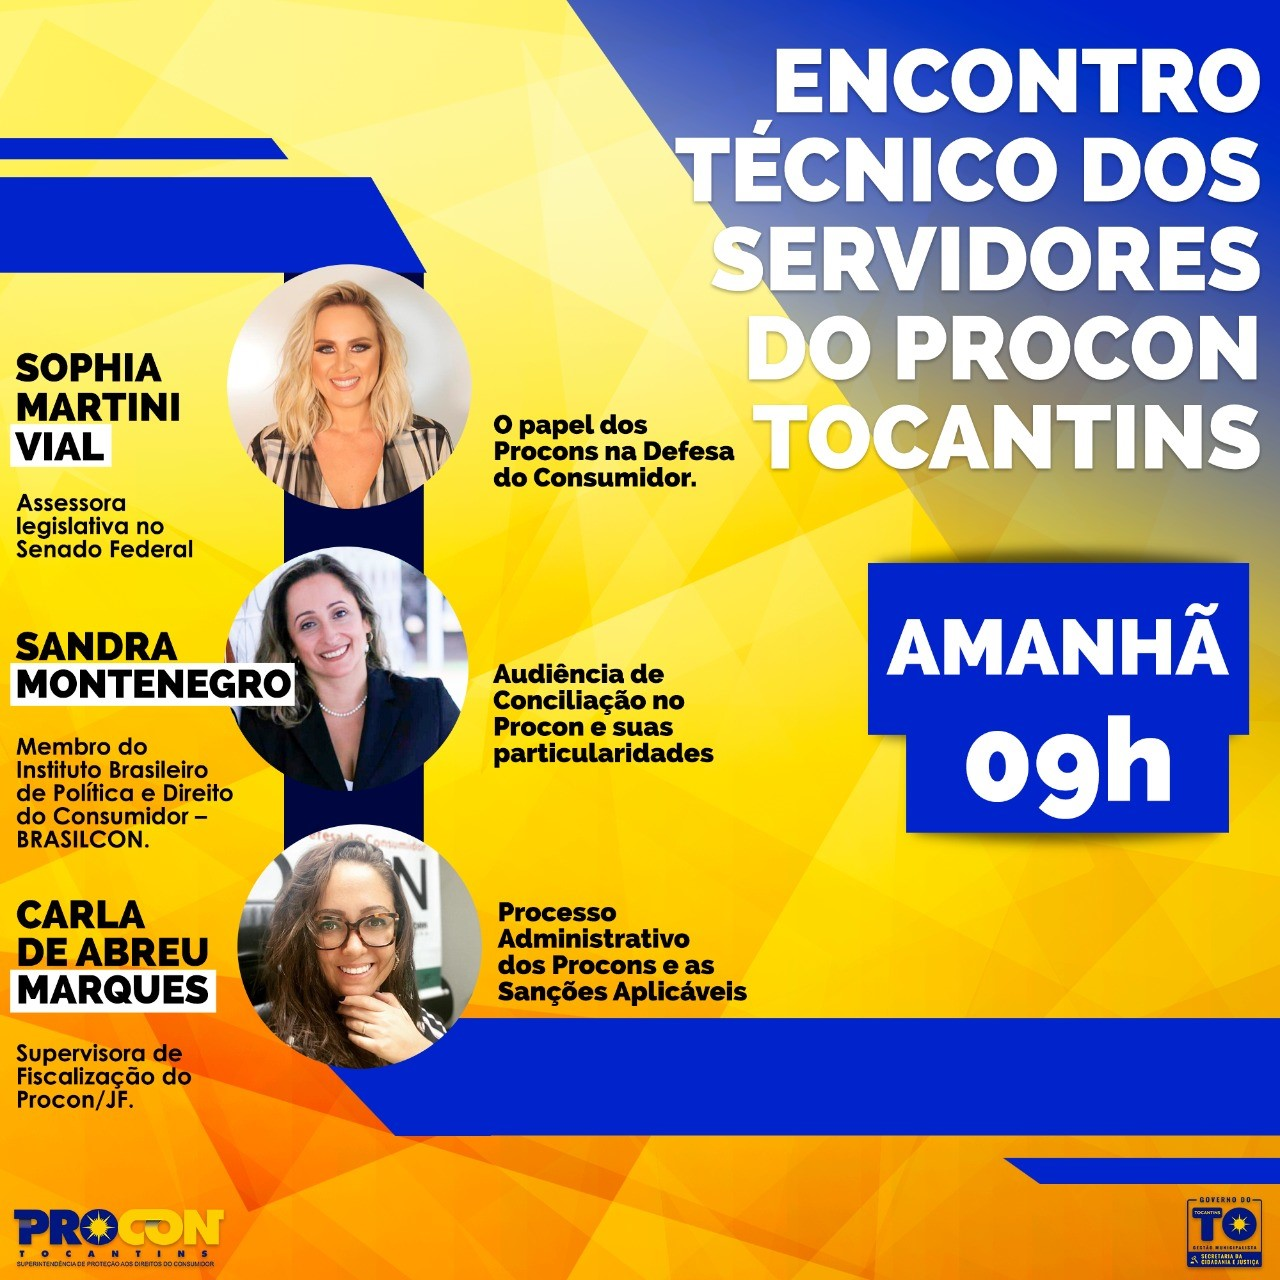 Procon Tocantins realiza 1º Encontro Técnico para servidores